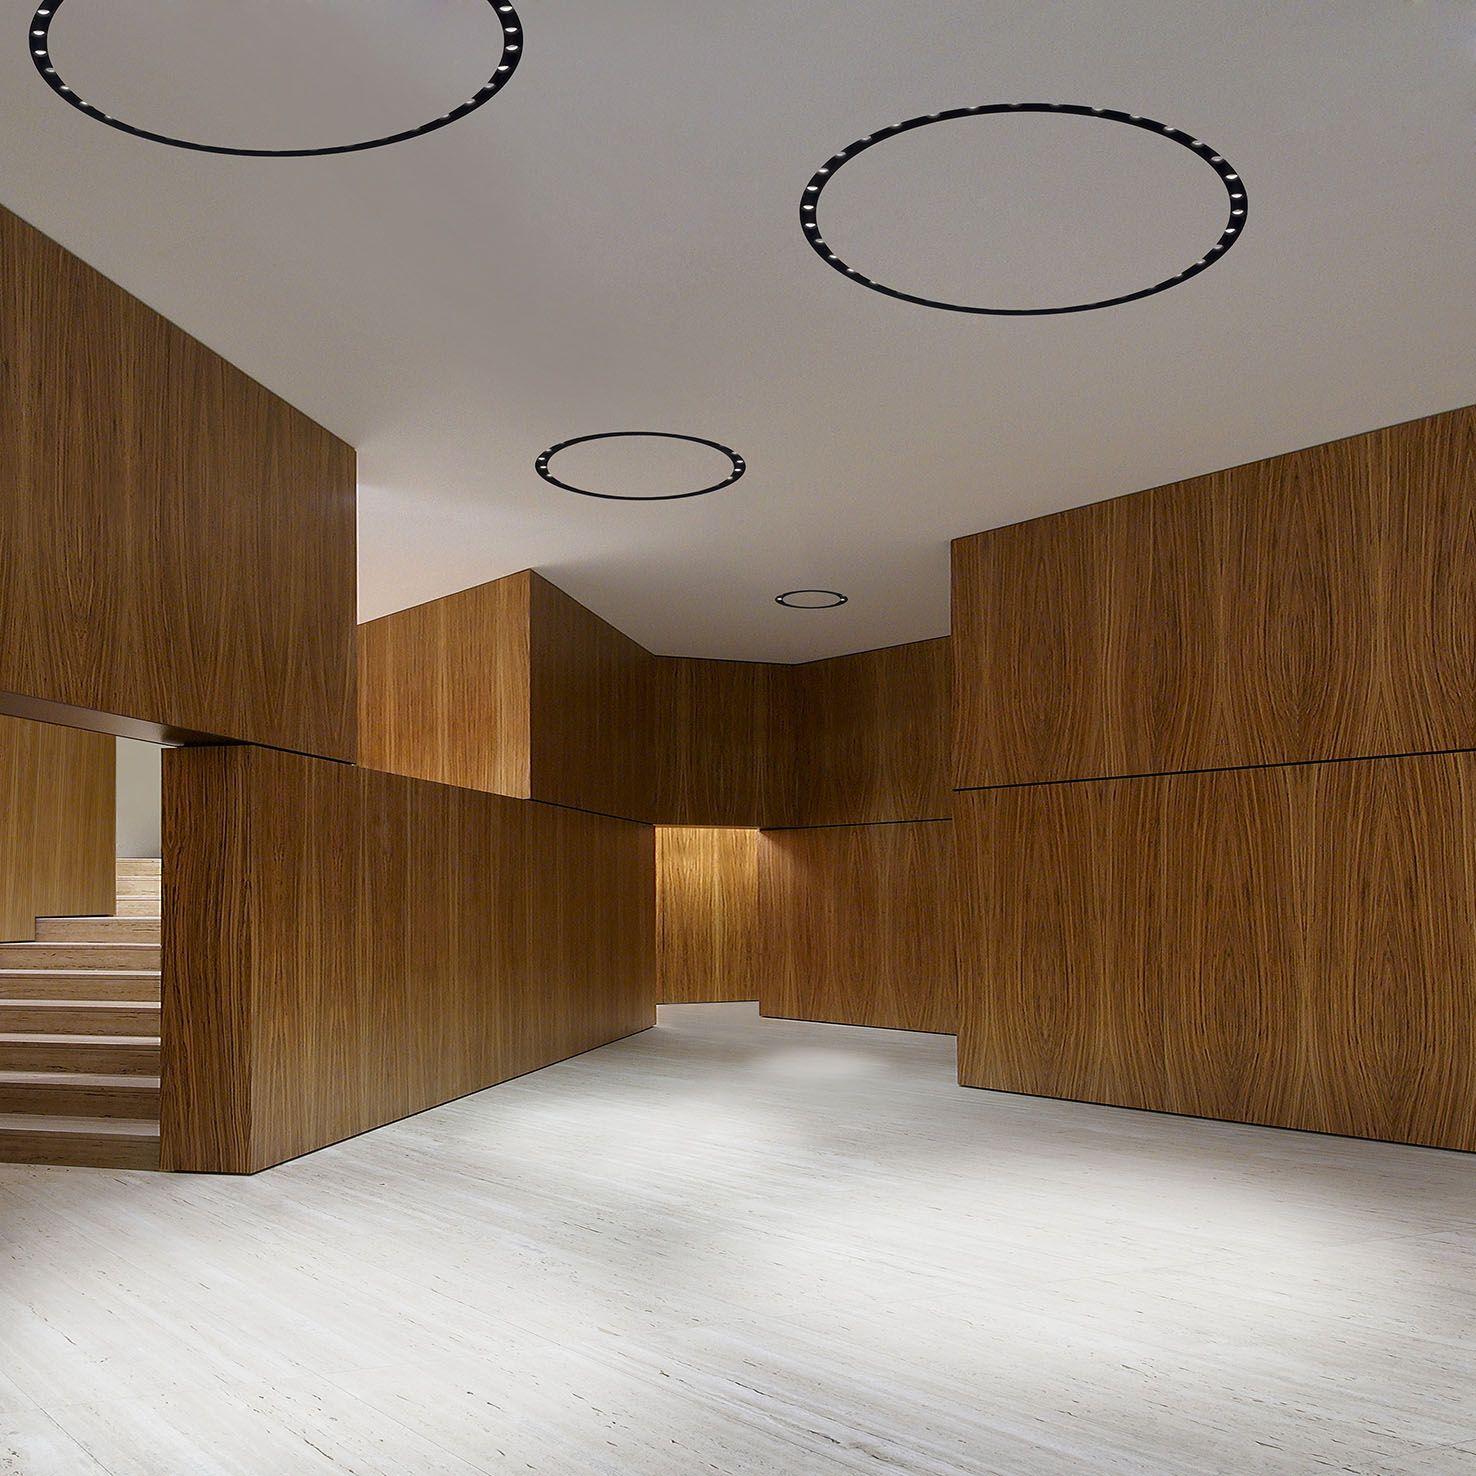 Circleoflight Flosarchitectural Architecturallighting Lightninginspiration Flos Light Linear Lighting Flos